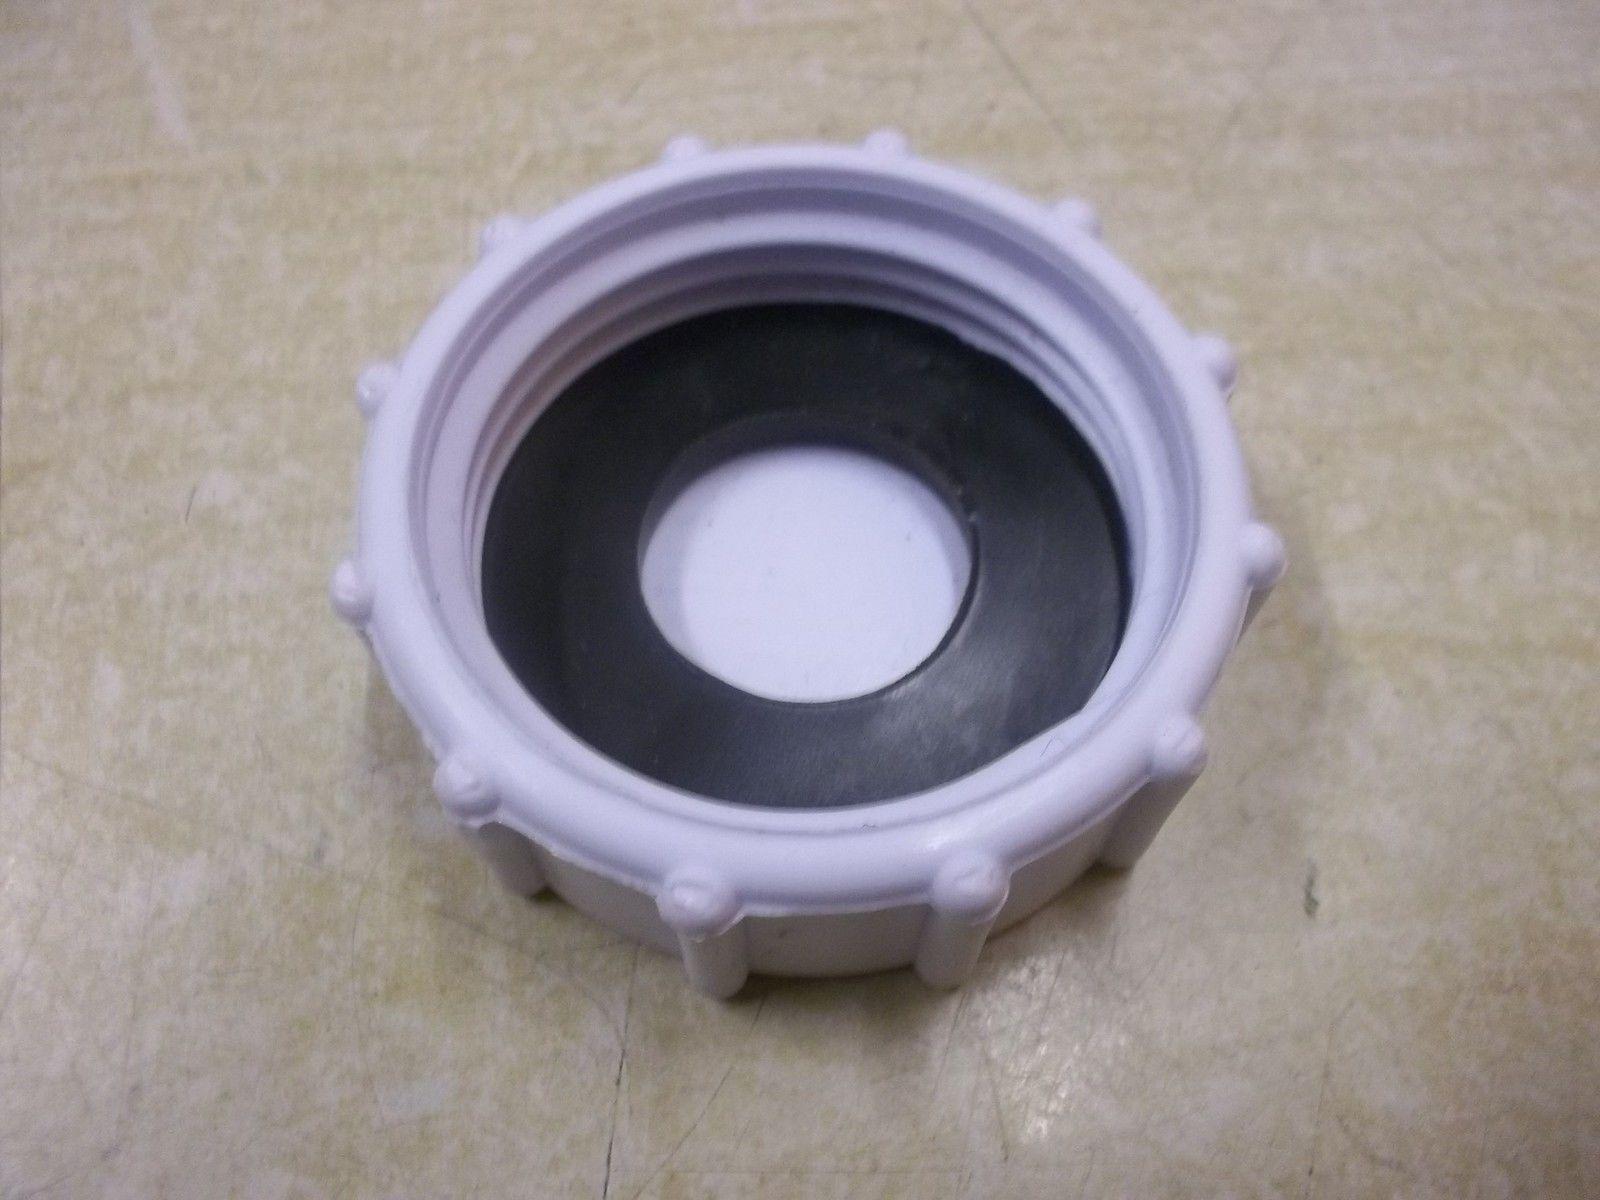 Buy Spigot Cap End Stop For Washing Machine Dishwasher